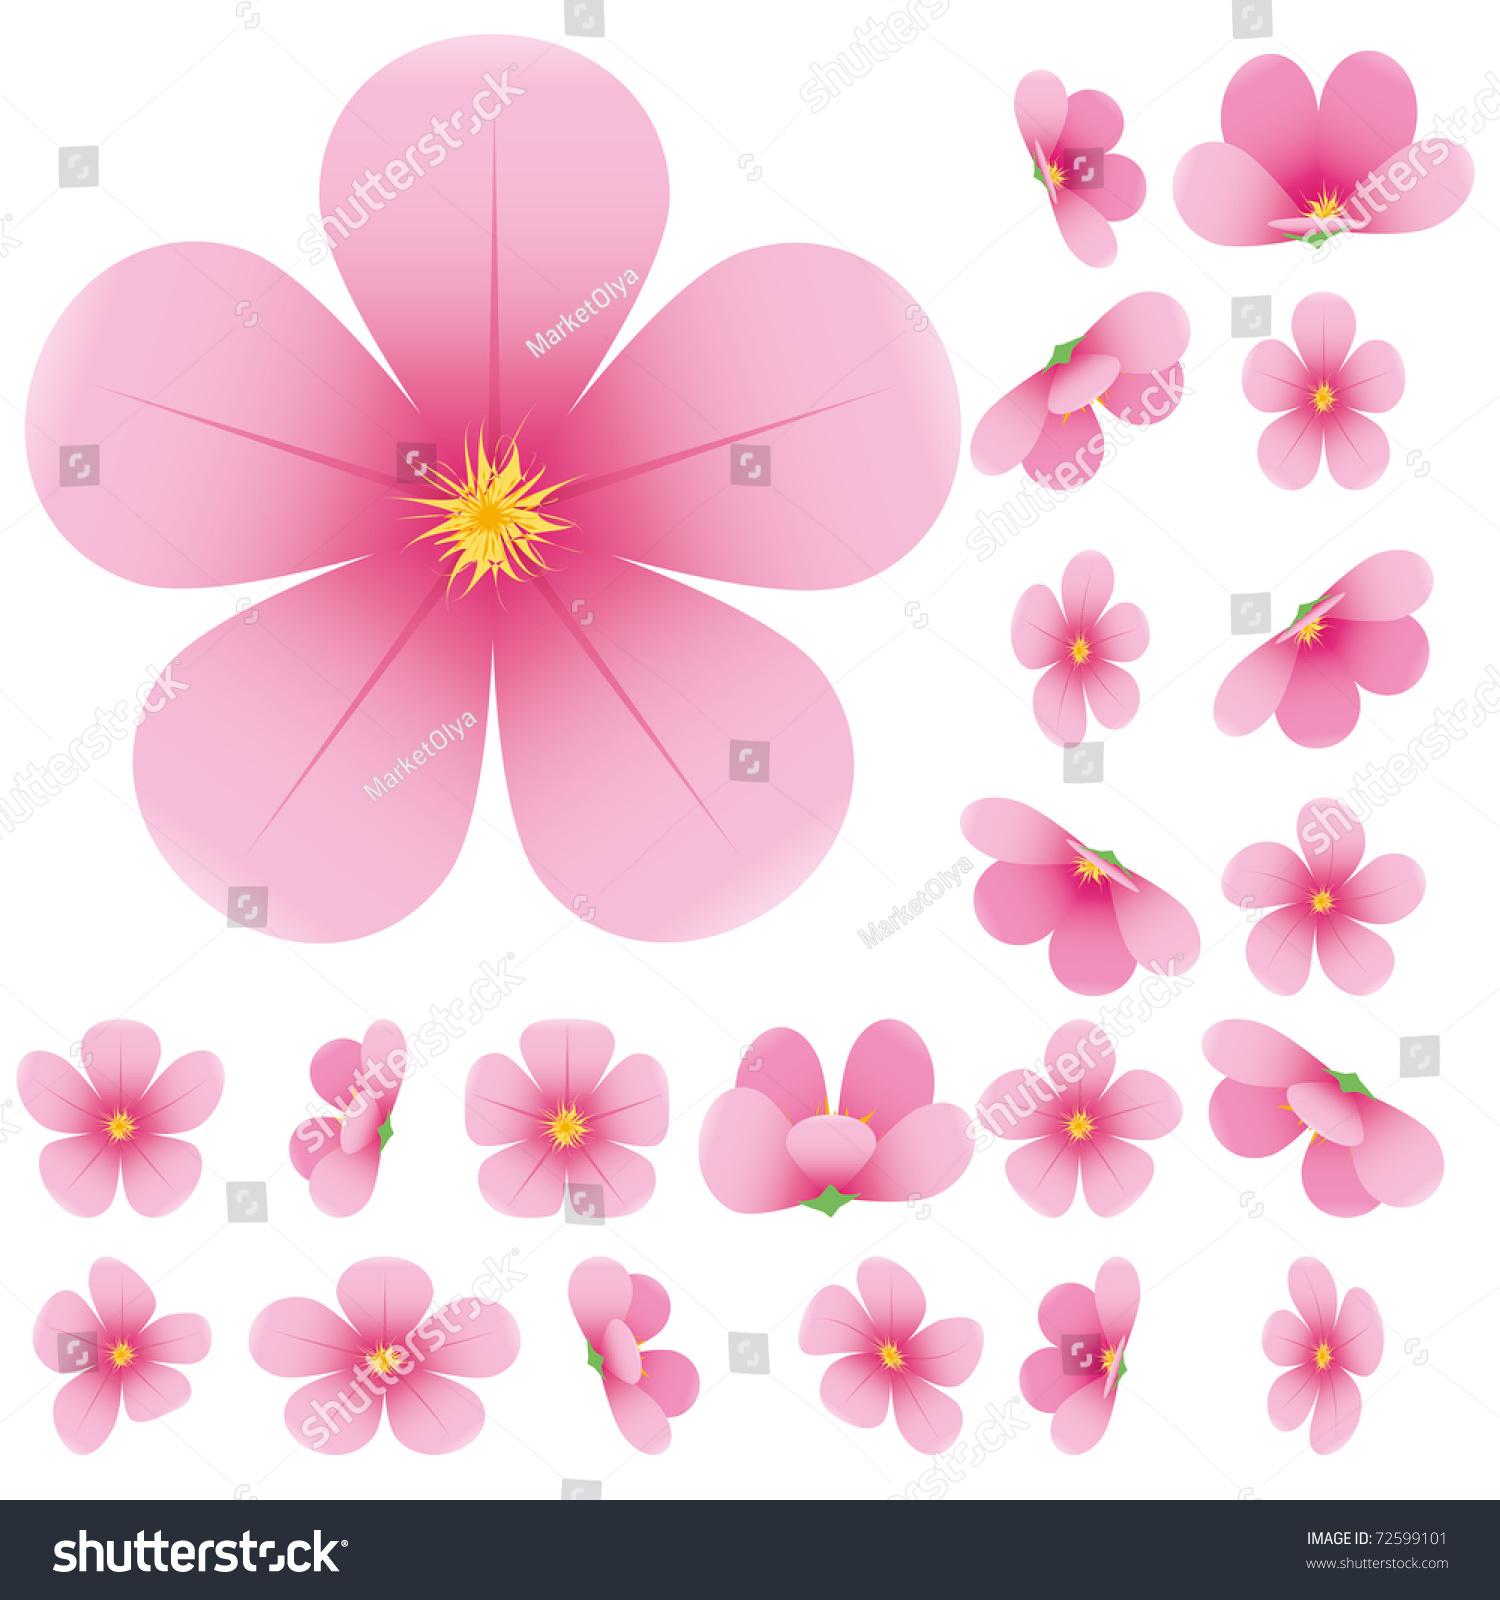 Cherry blossom flowers sakura set pink stock vector royalty free cherry blossom flowers of sakura set pink flowers collectionvector illustration mightylinksfo